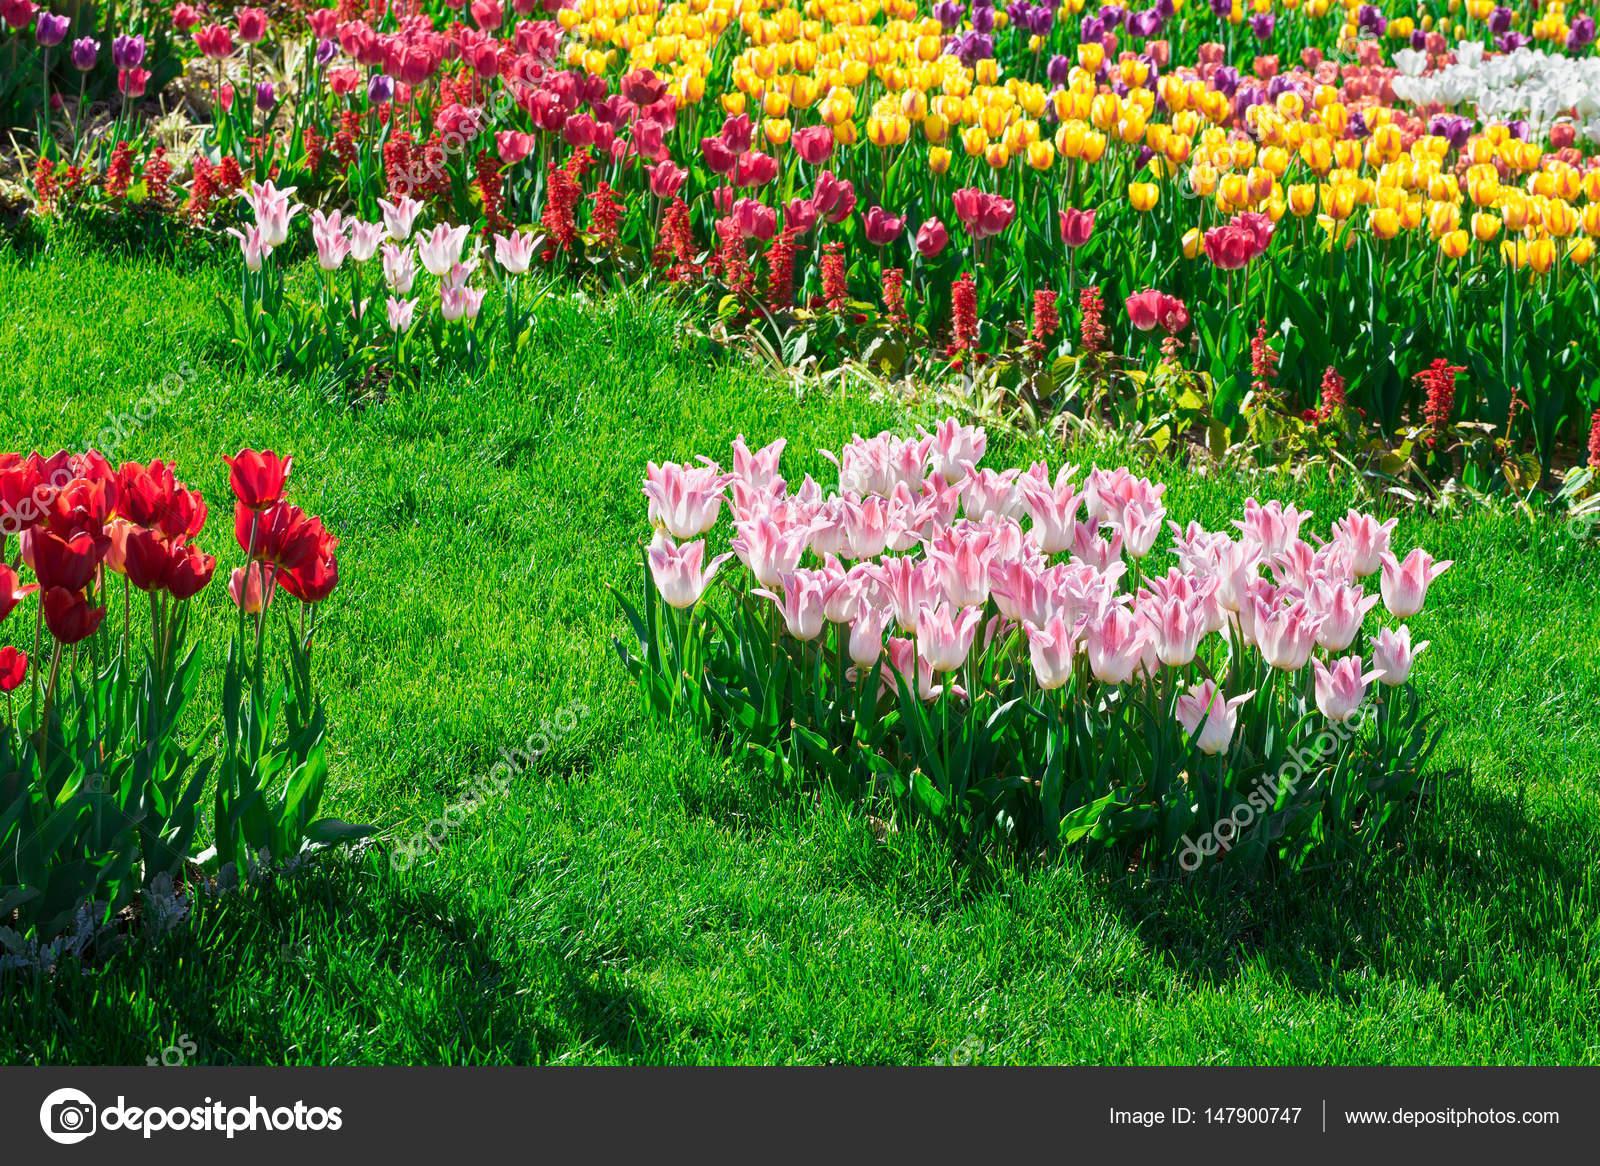 Tulips blooming flowers field green grass lawn in beautiful spring tulips blooming flowers field green grass lawn in beautiful spring garden in the backlight izmirmasajfo